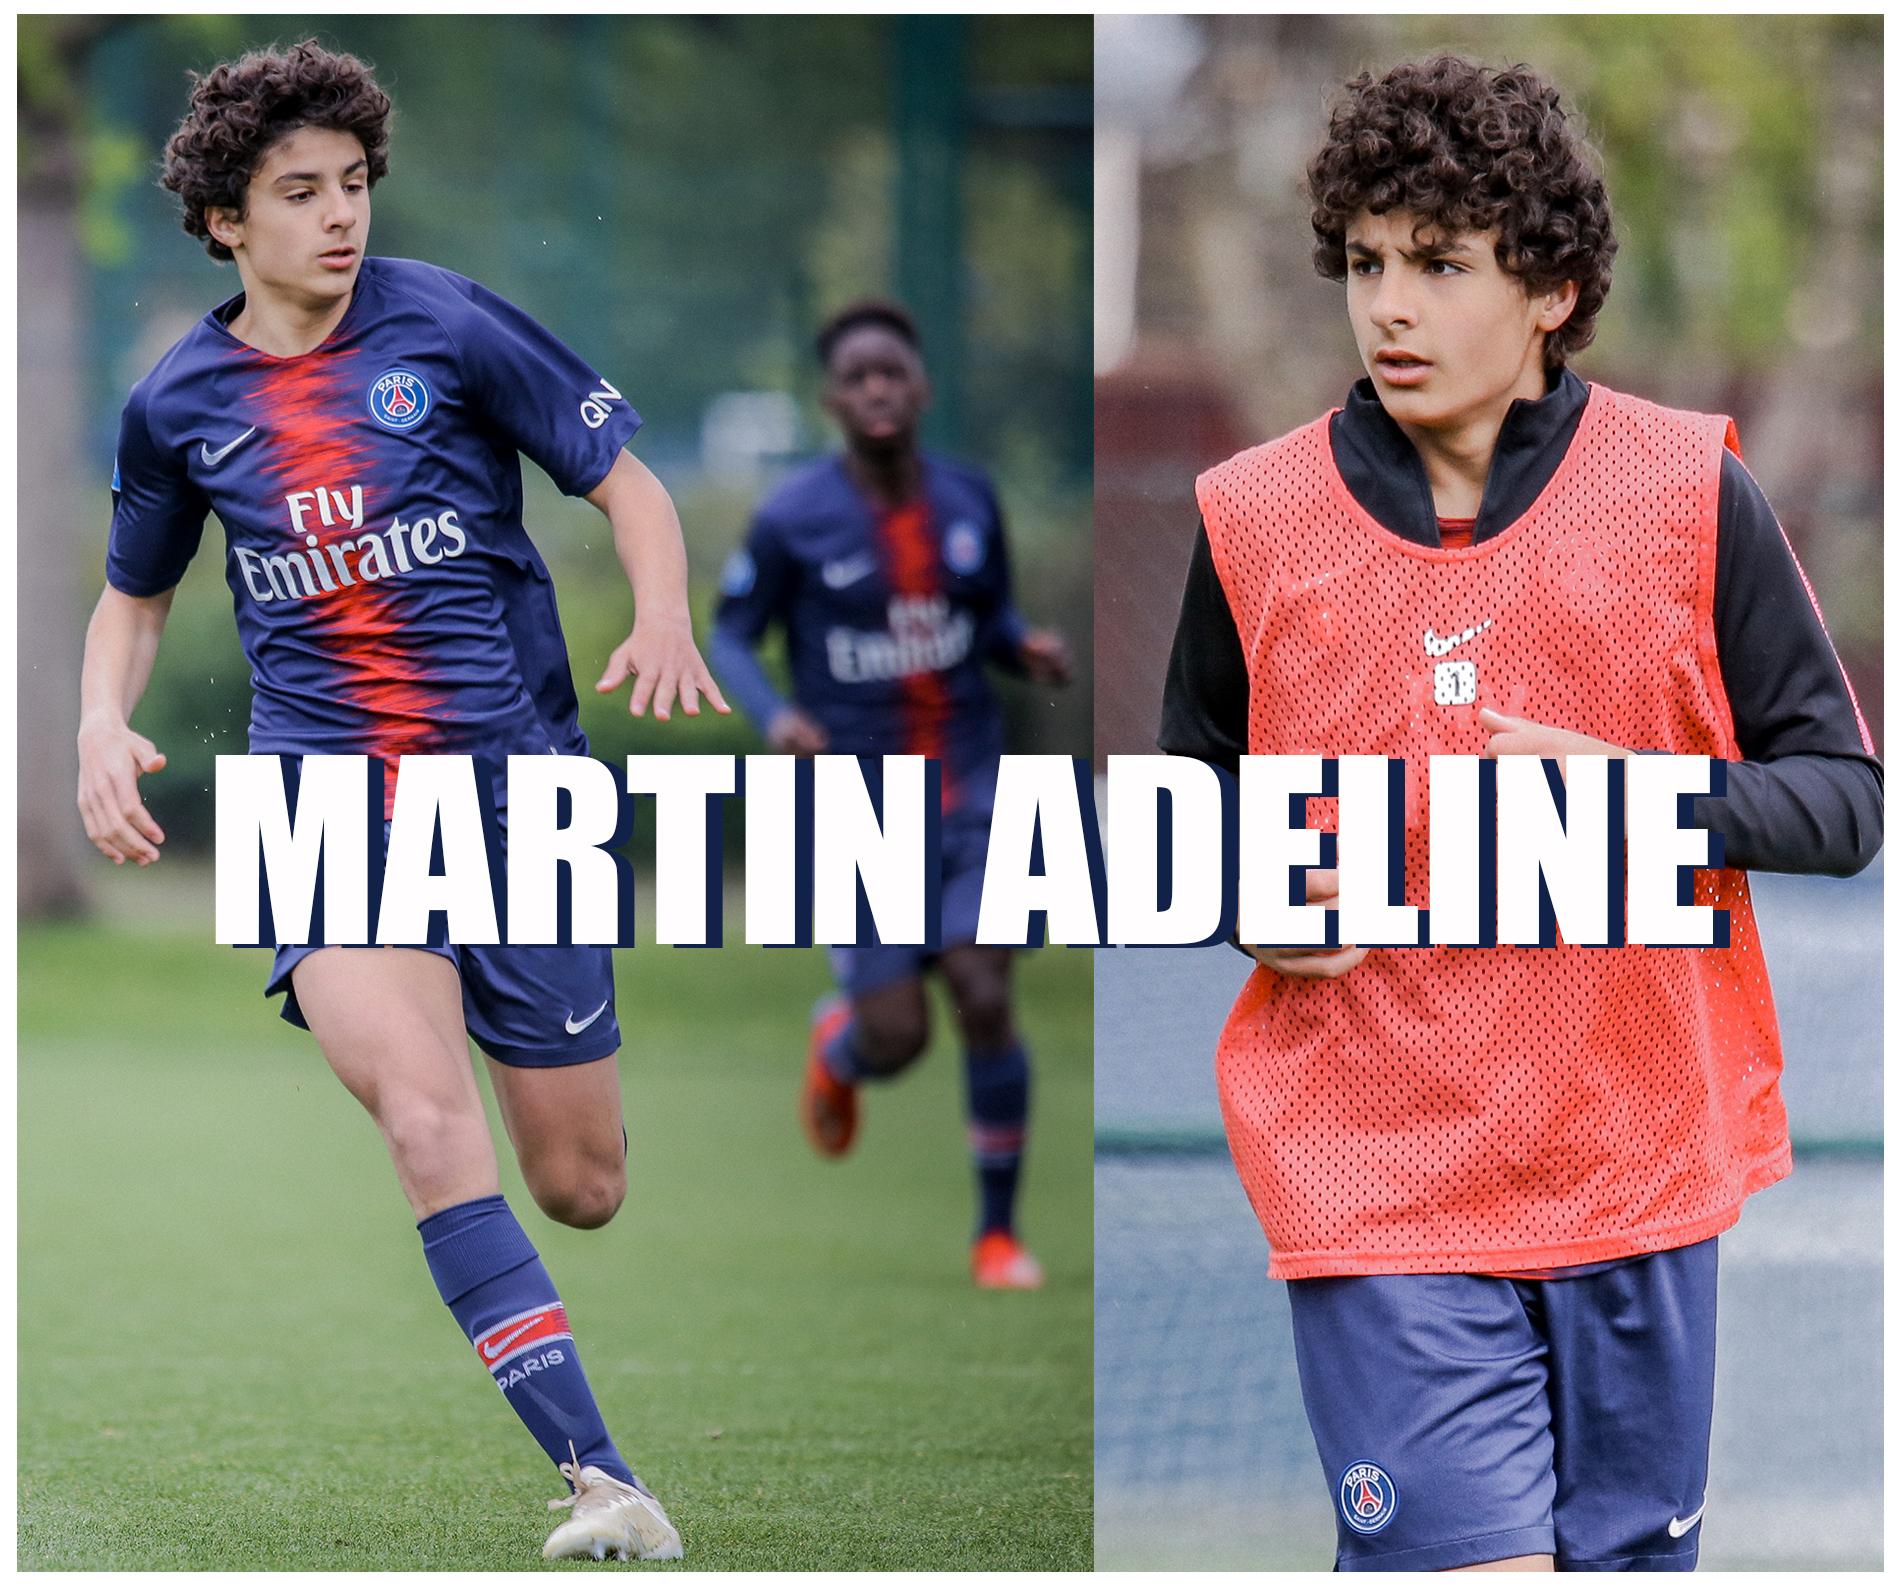 Martin Adeline milieu de terrain U17